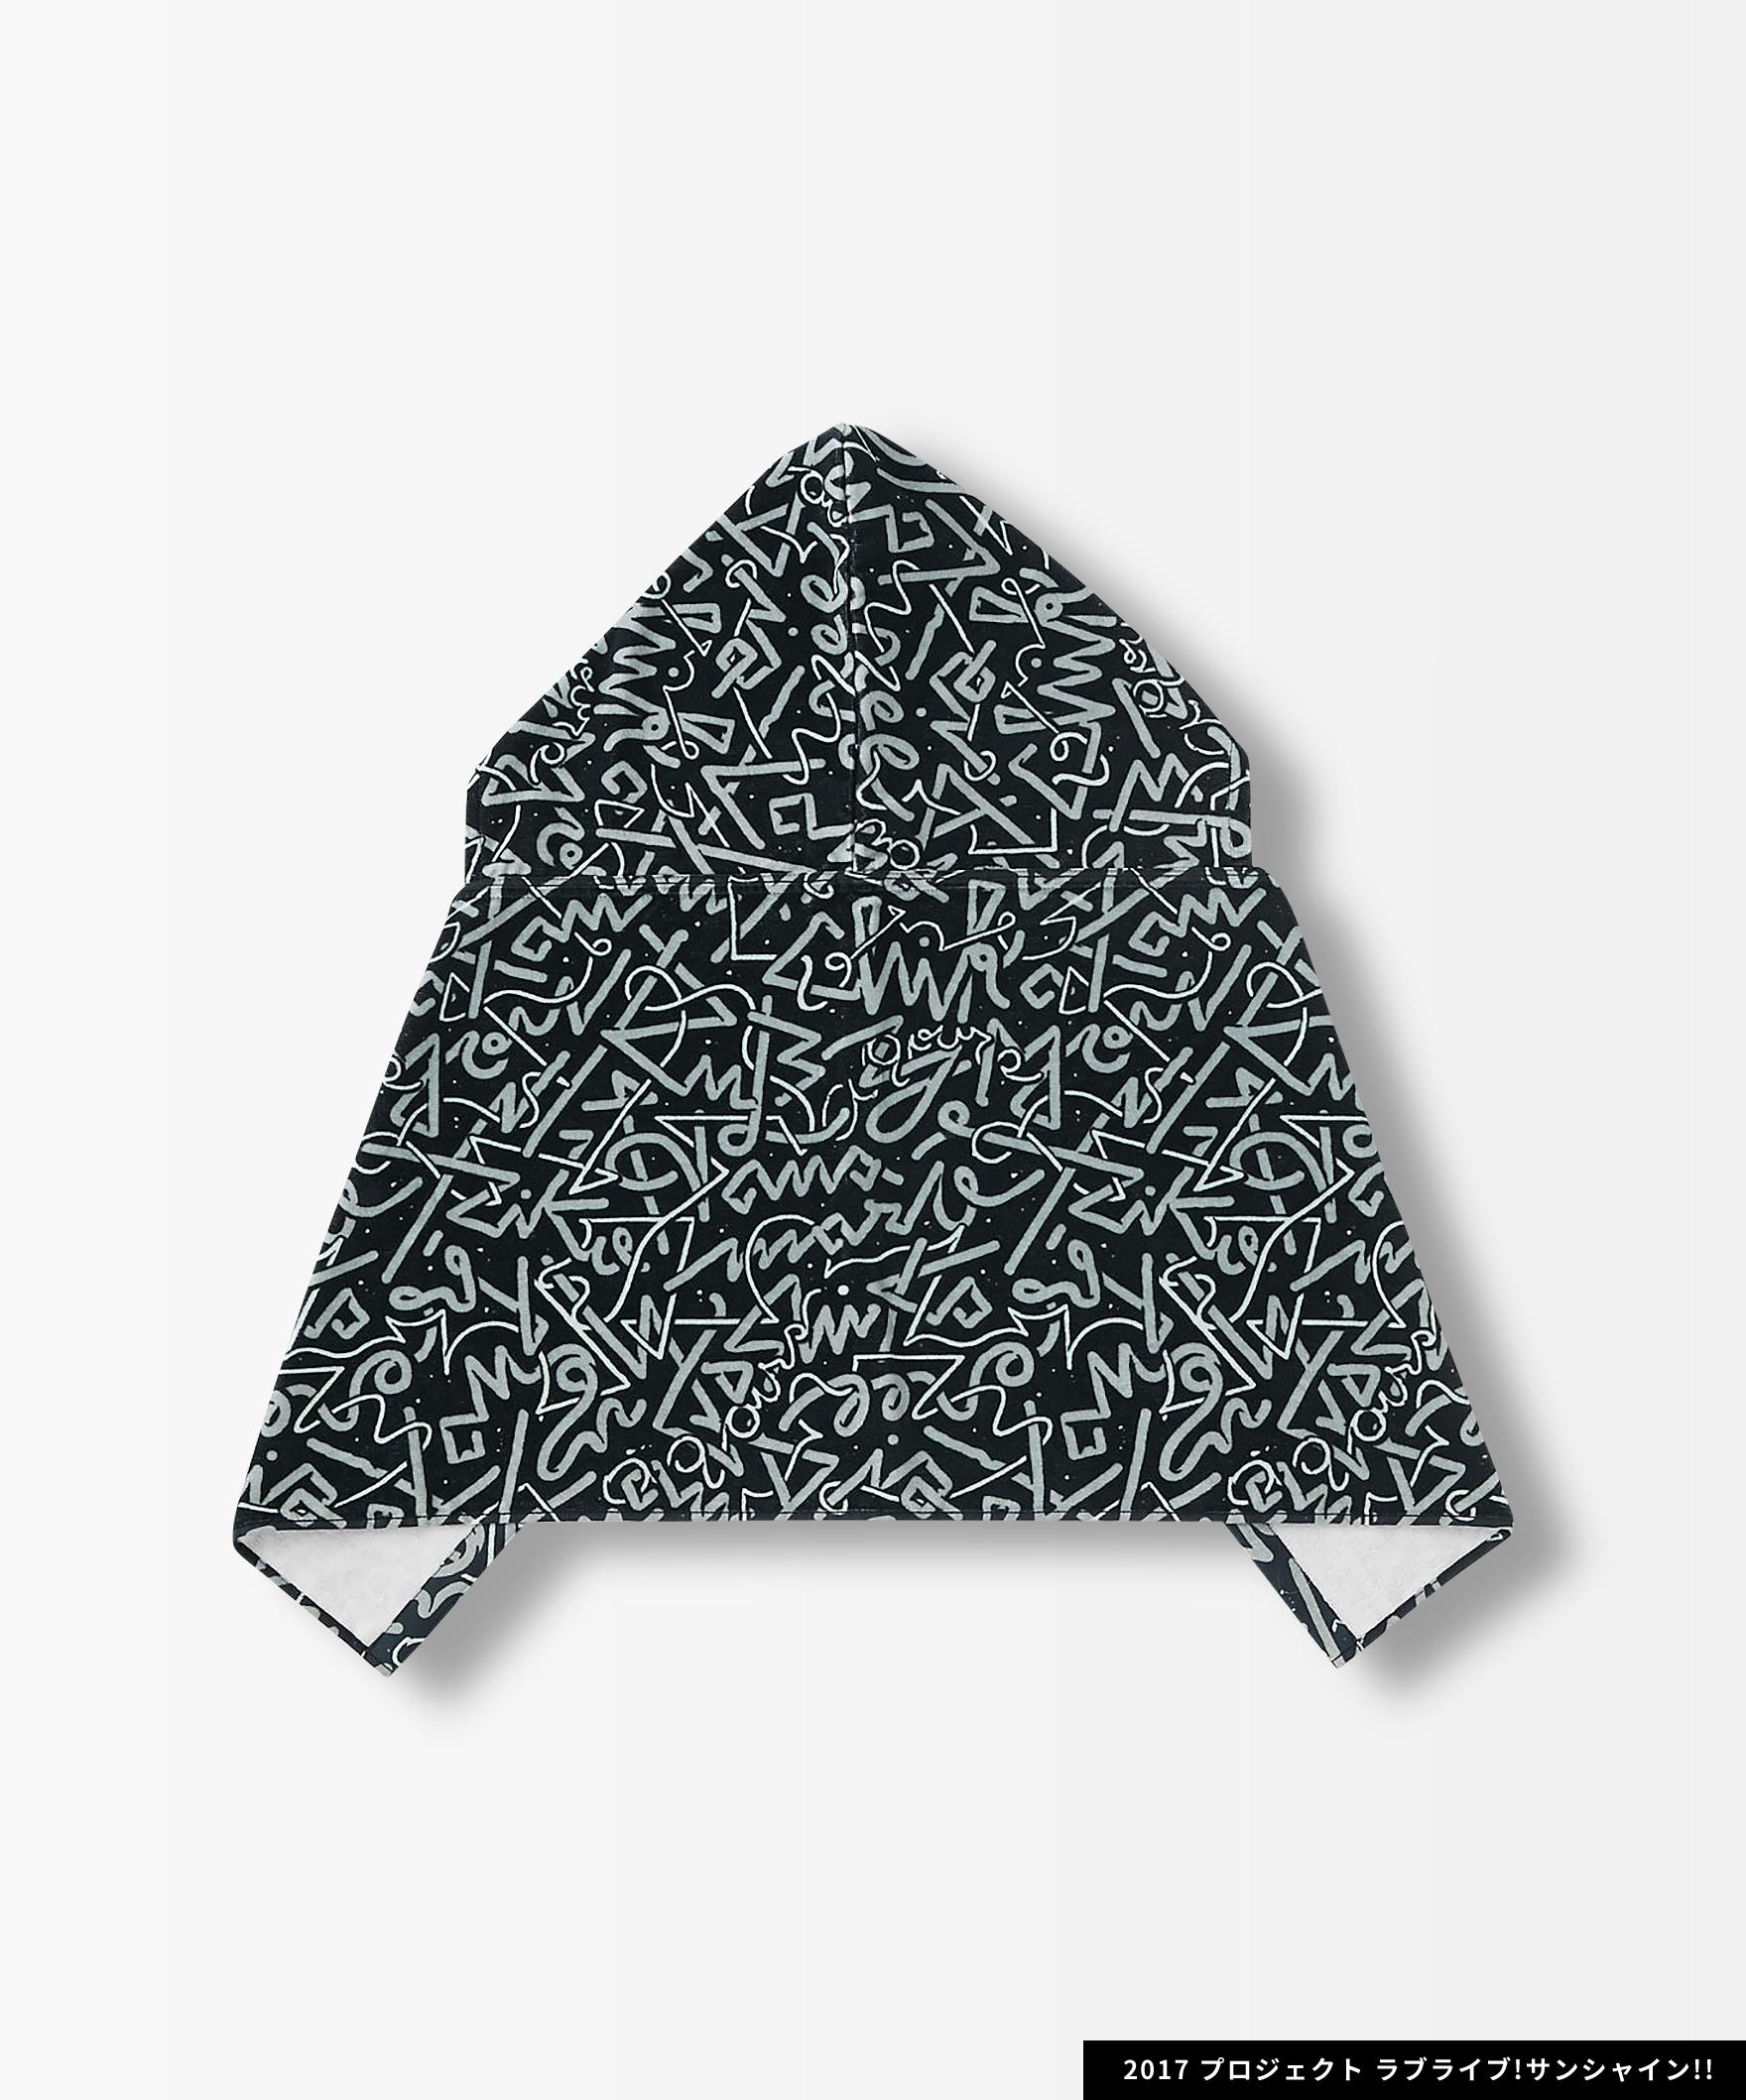 Aqours HOODED TOWEL